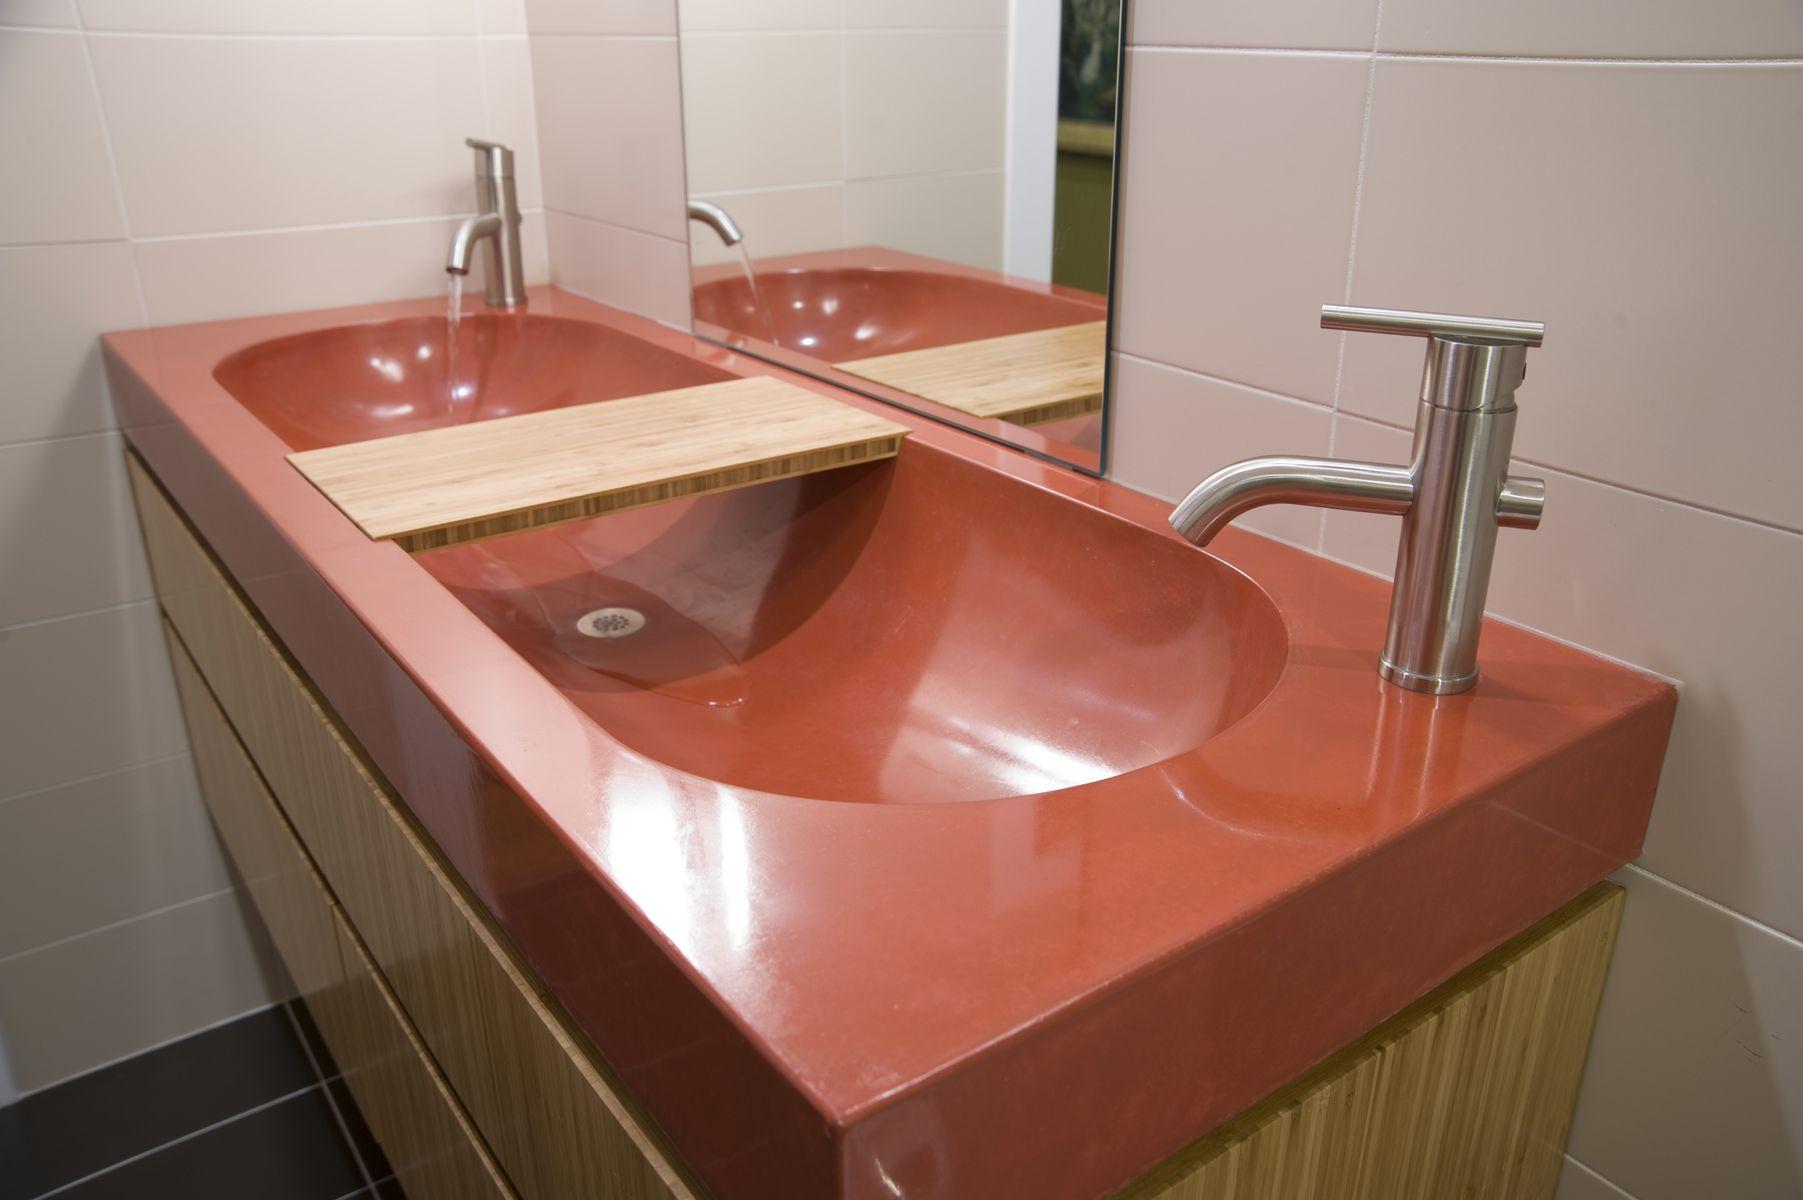 Bathroom Granite Kitchen Sinks Commercial Stainless Steel Sink Small Bathroom Sinks For Sale Concrete Sink Bathroom Sinks For Sale Small Bathroom Sinks